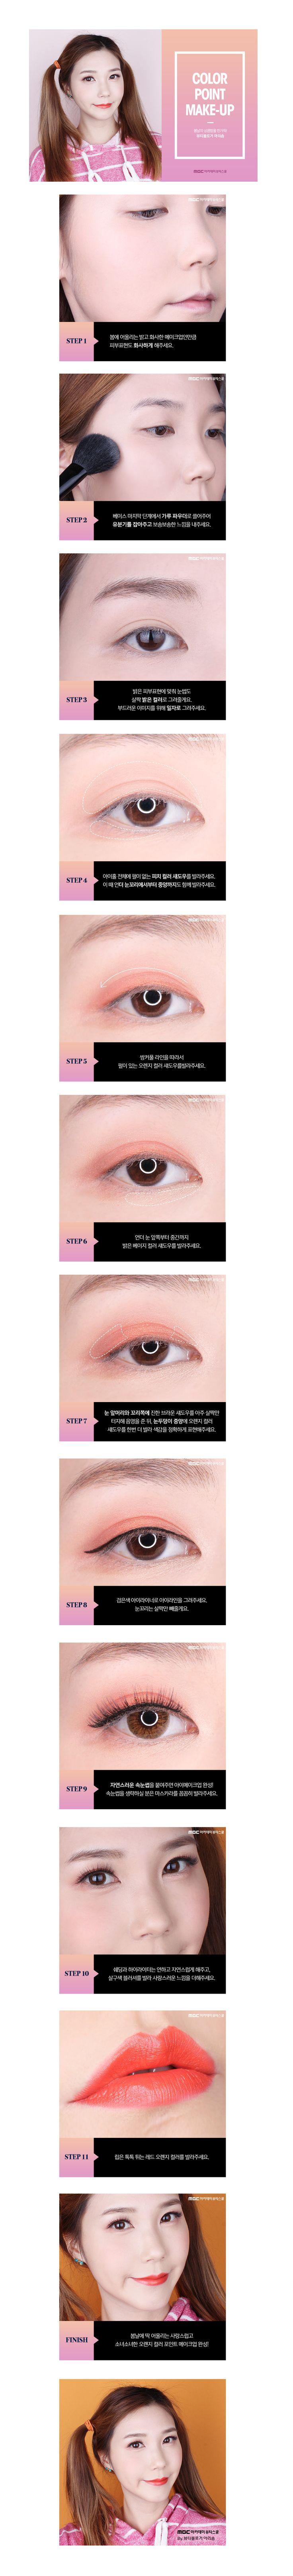 [sns] Face book_Color Point make up; BEauty contents Design